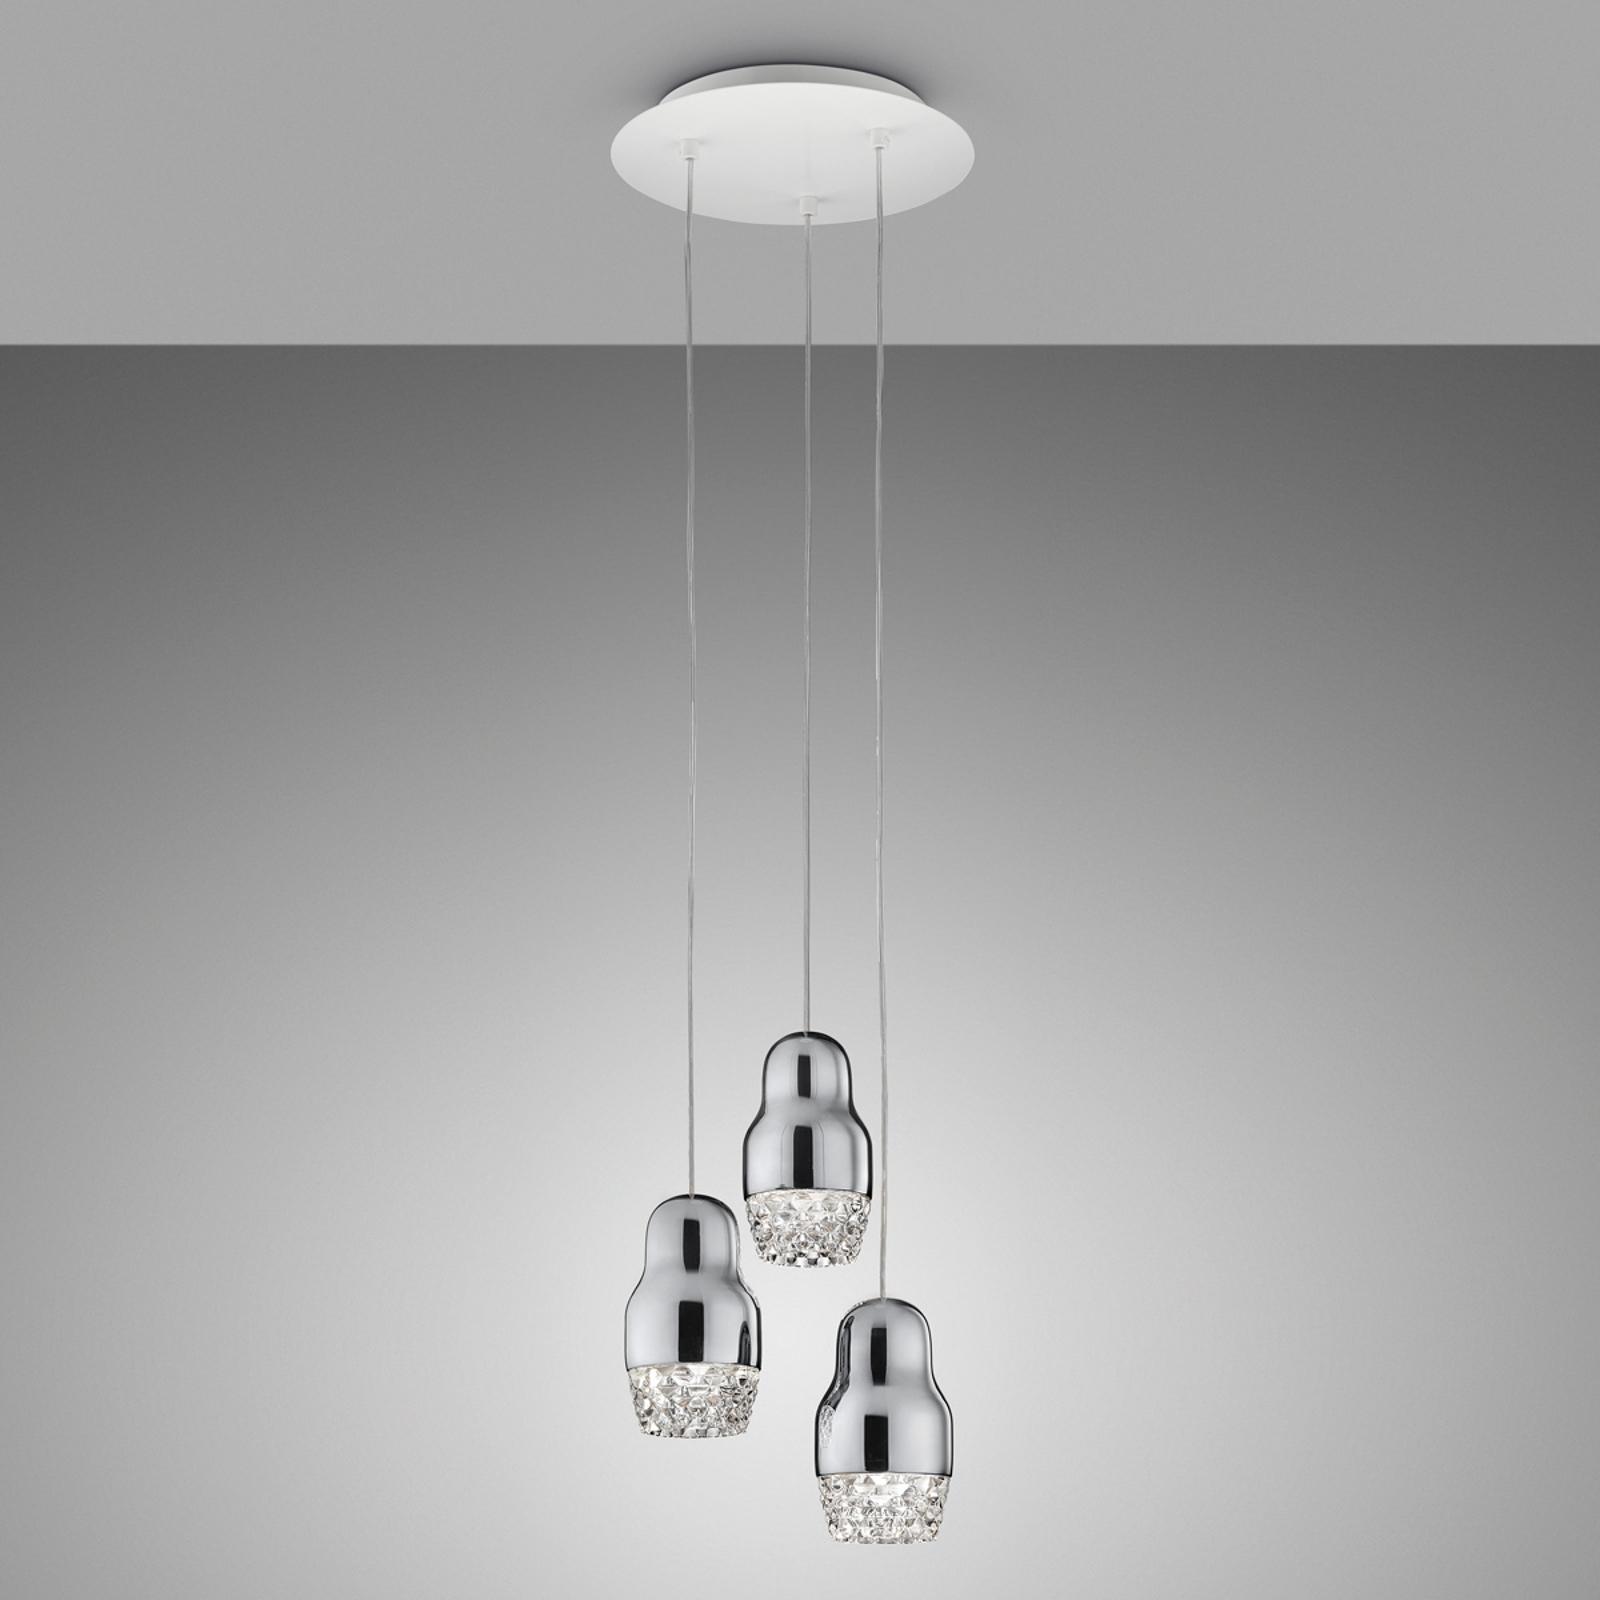 Axolight Fedora - LED-Hängeleuchte, chrom, 3flamm.